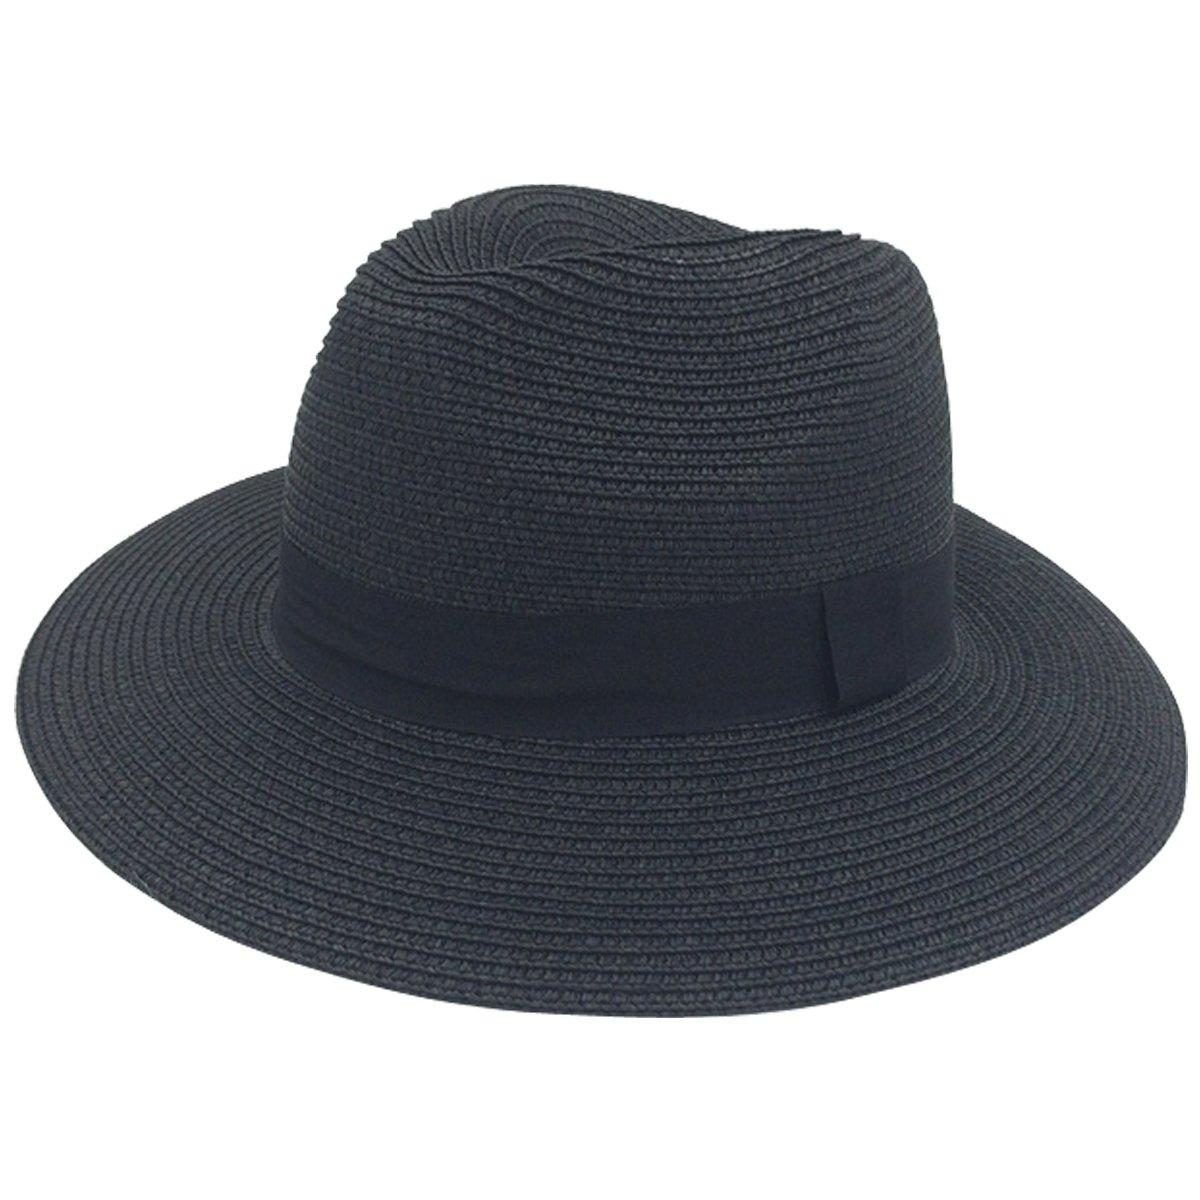 Lanzom Women Wide Brim Straw Panama Roll up Hat Fedora Beach Sun Hat UPF50+ (A-Black)